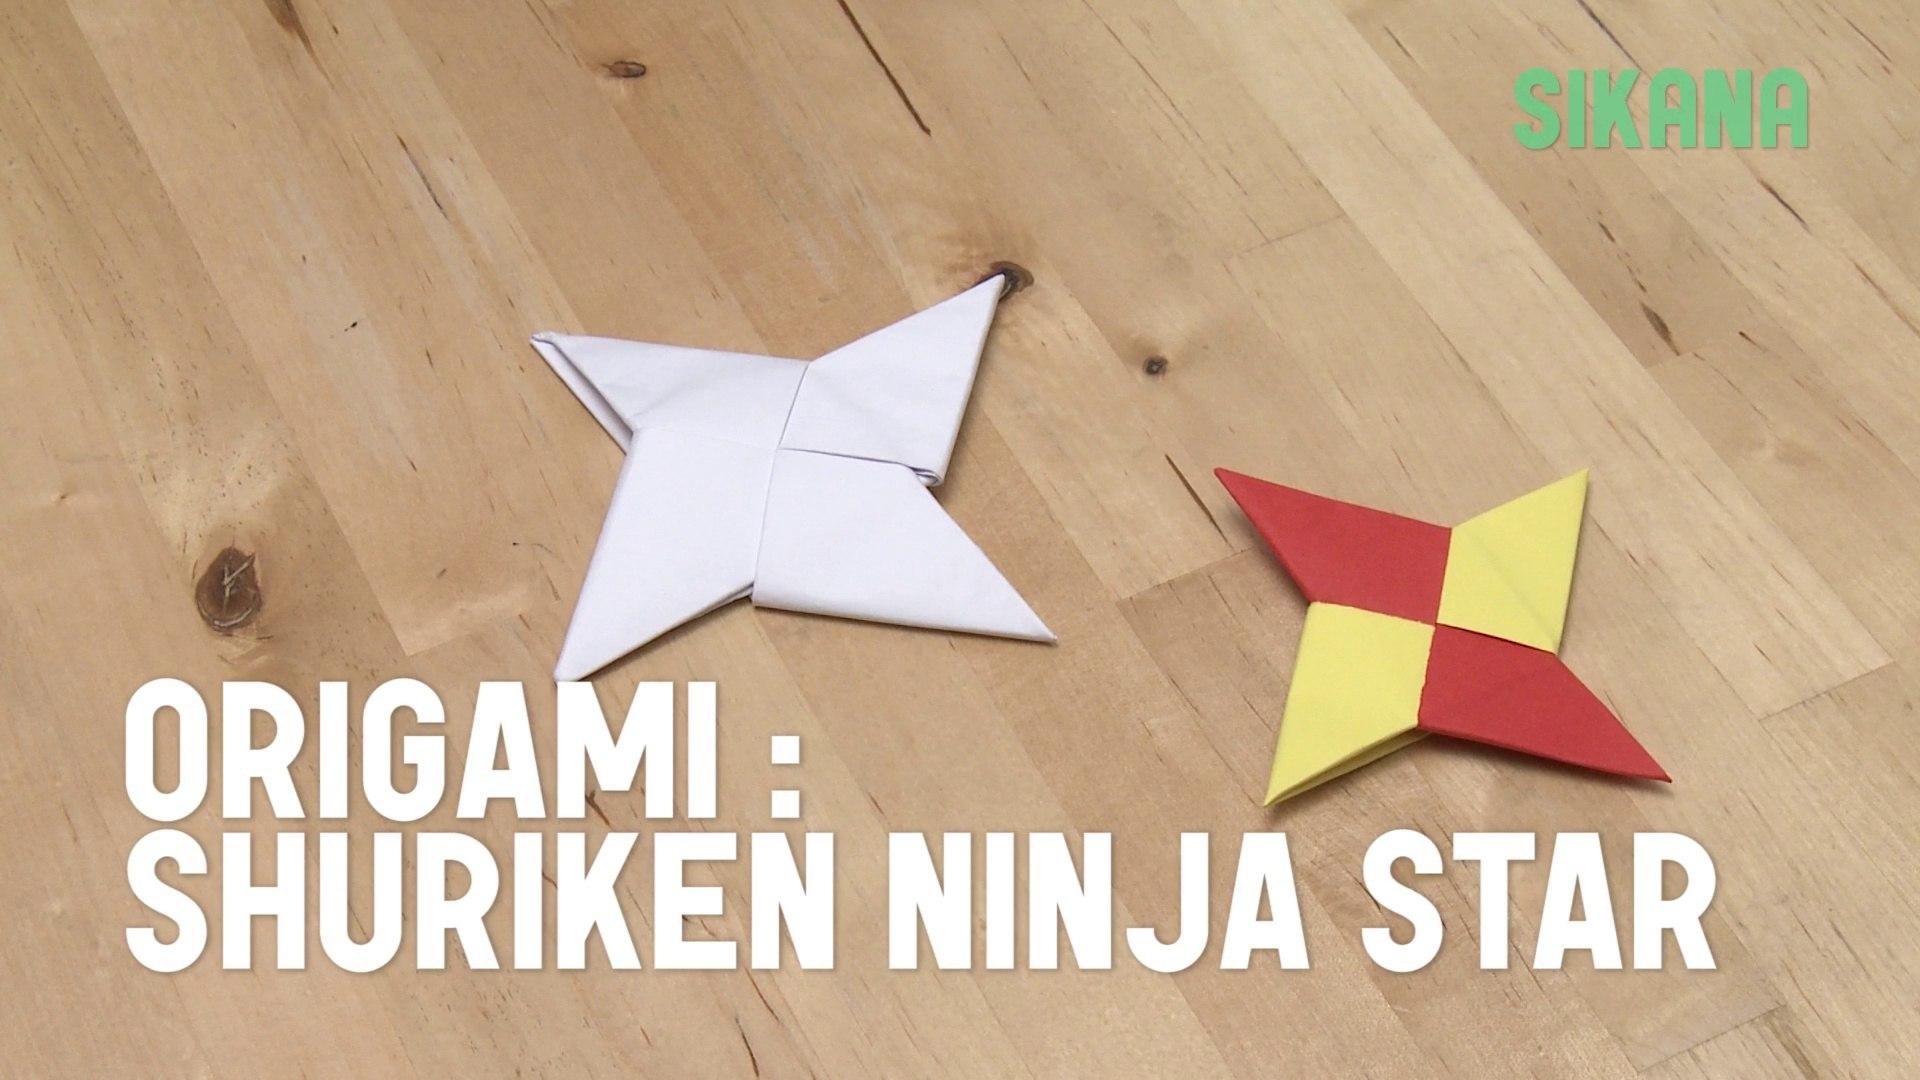 How to make an Origami Ninja Star (Easy Tutorial) - YouTube | 1080x1920